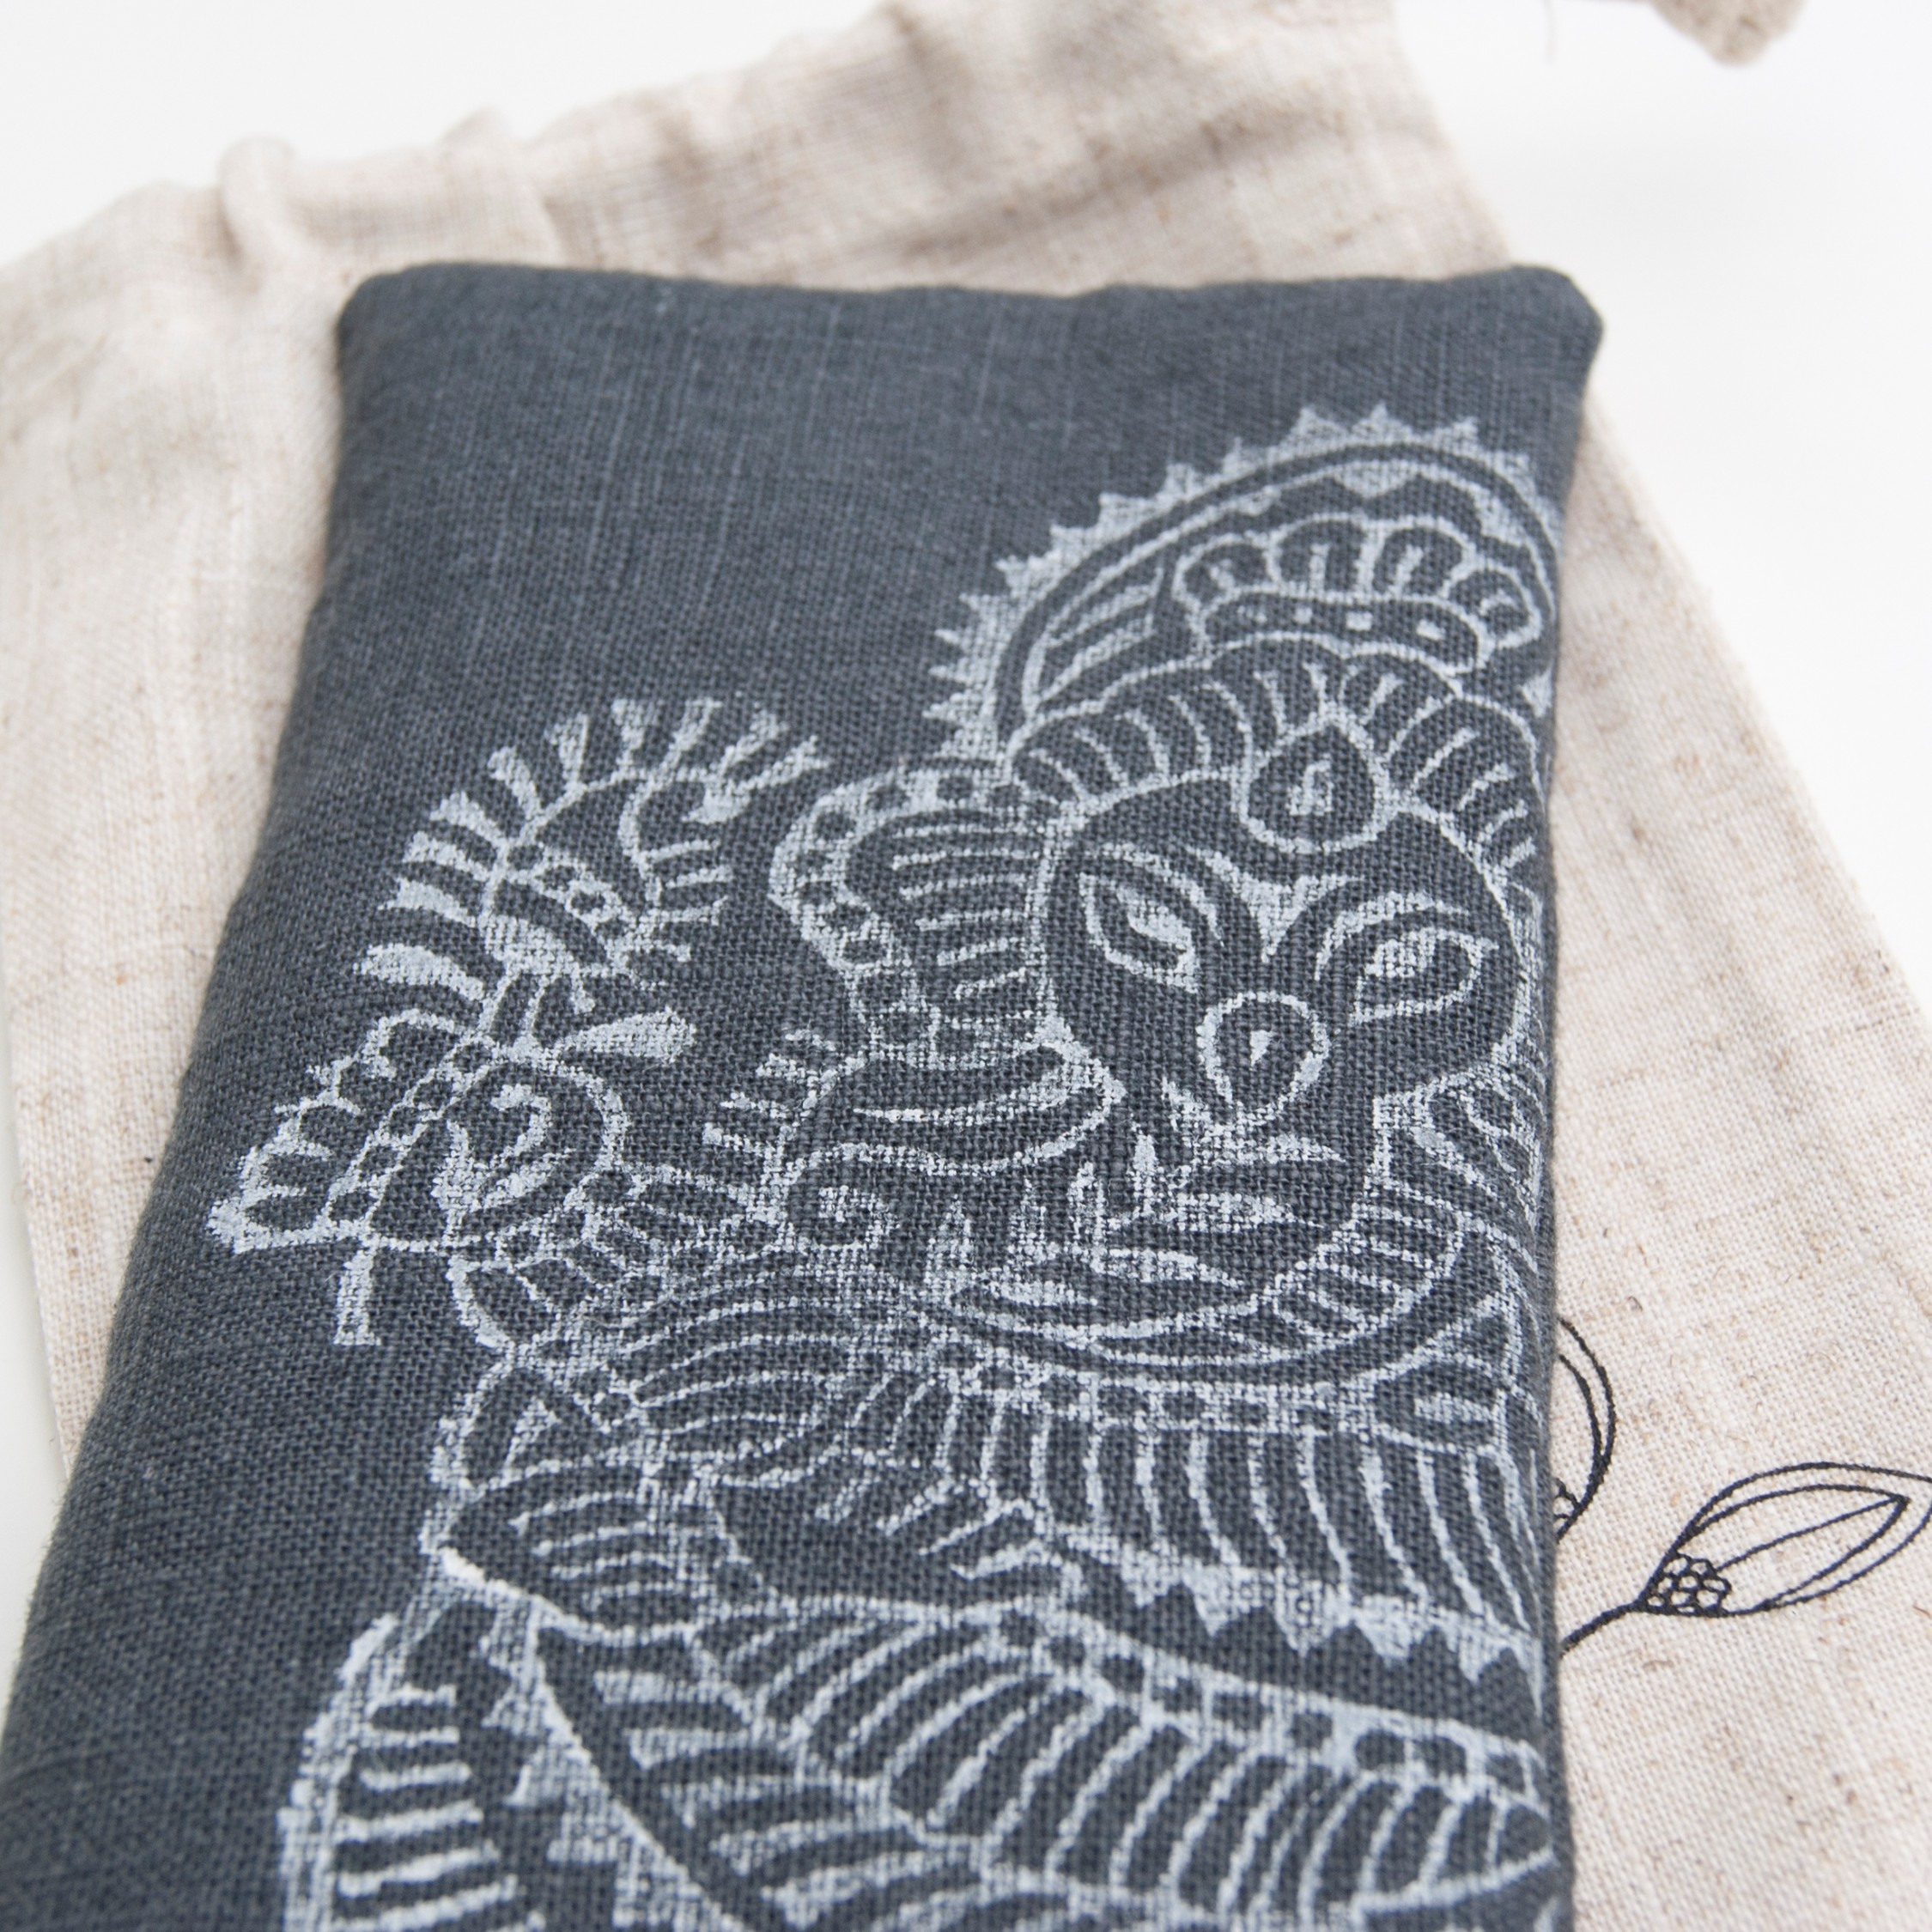 Lavender eye pillow Ganesh by Pure Prana Label